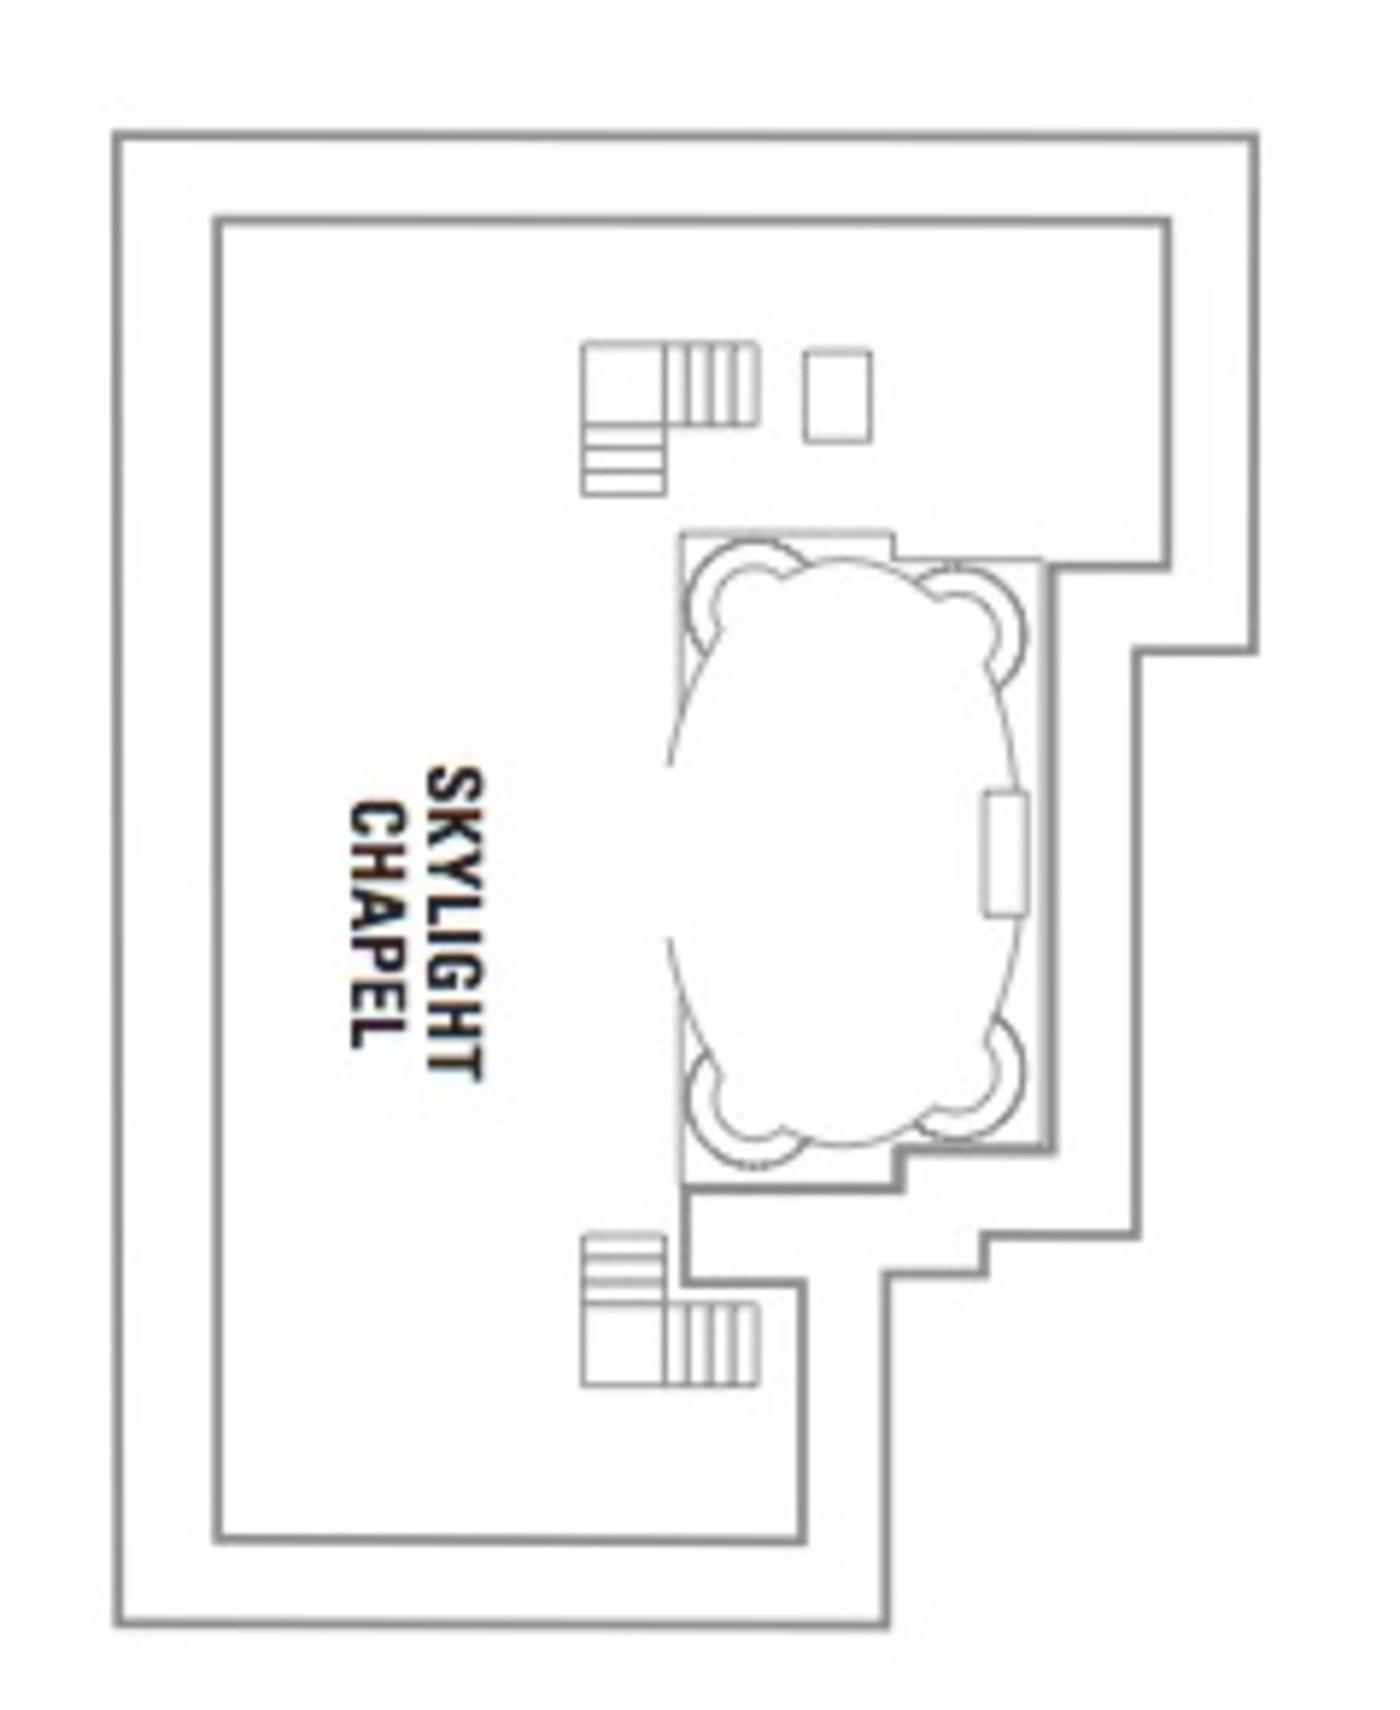 100 Majesty Of The Seas Floor Plan Deck 3 Harmony